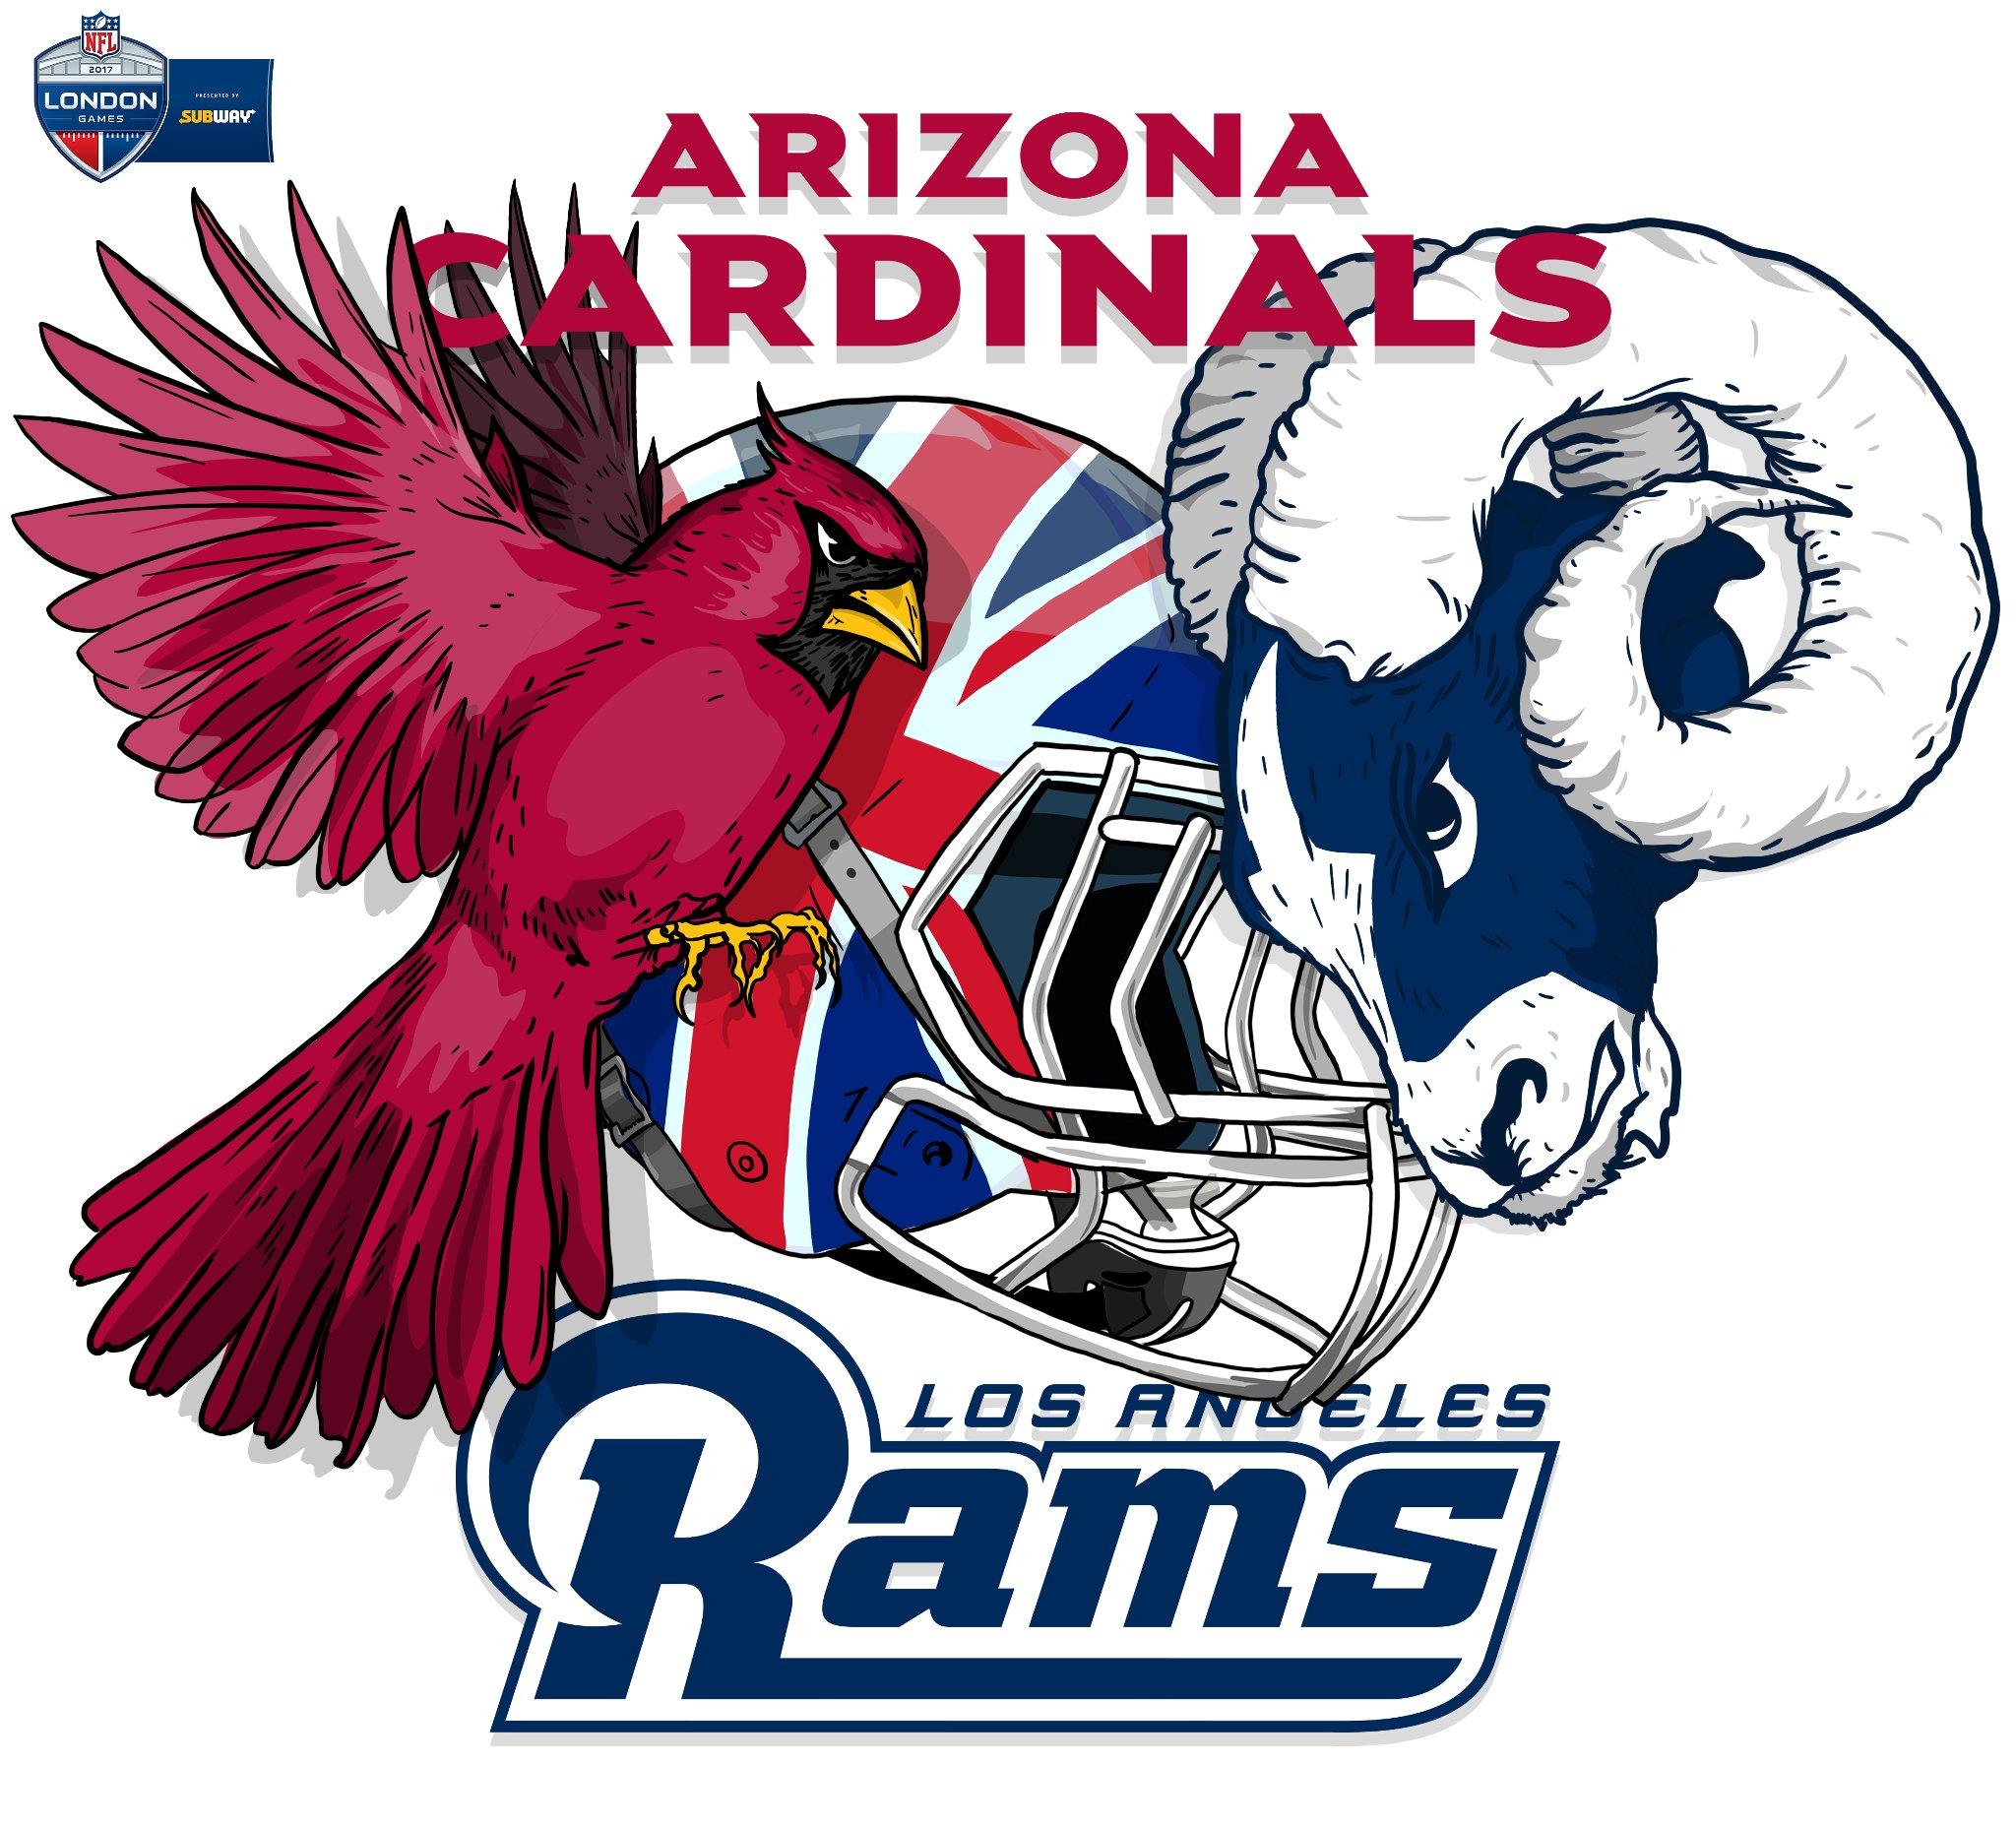 GAMEDAY IN ����!  Who's ready for @AZCardinals vs. @RamsNFL?! #AZvsLA #NFLUK https://t.co/o72kgeTDWe